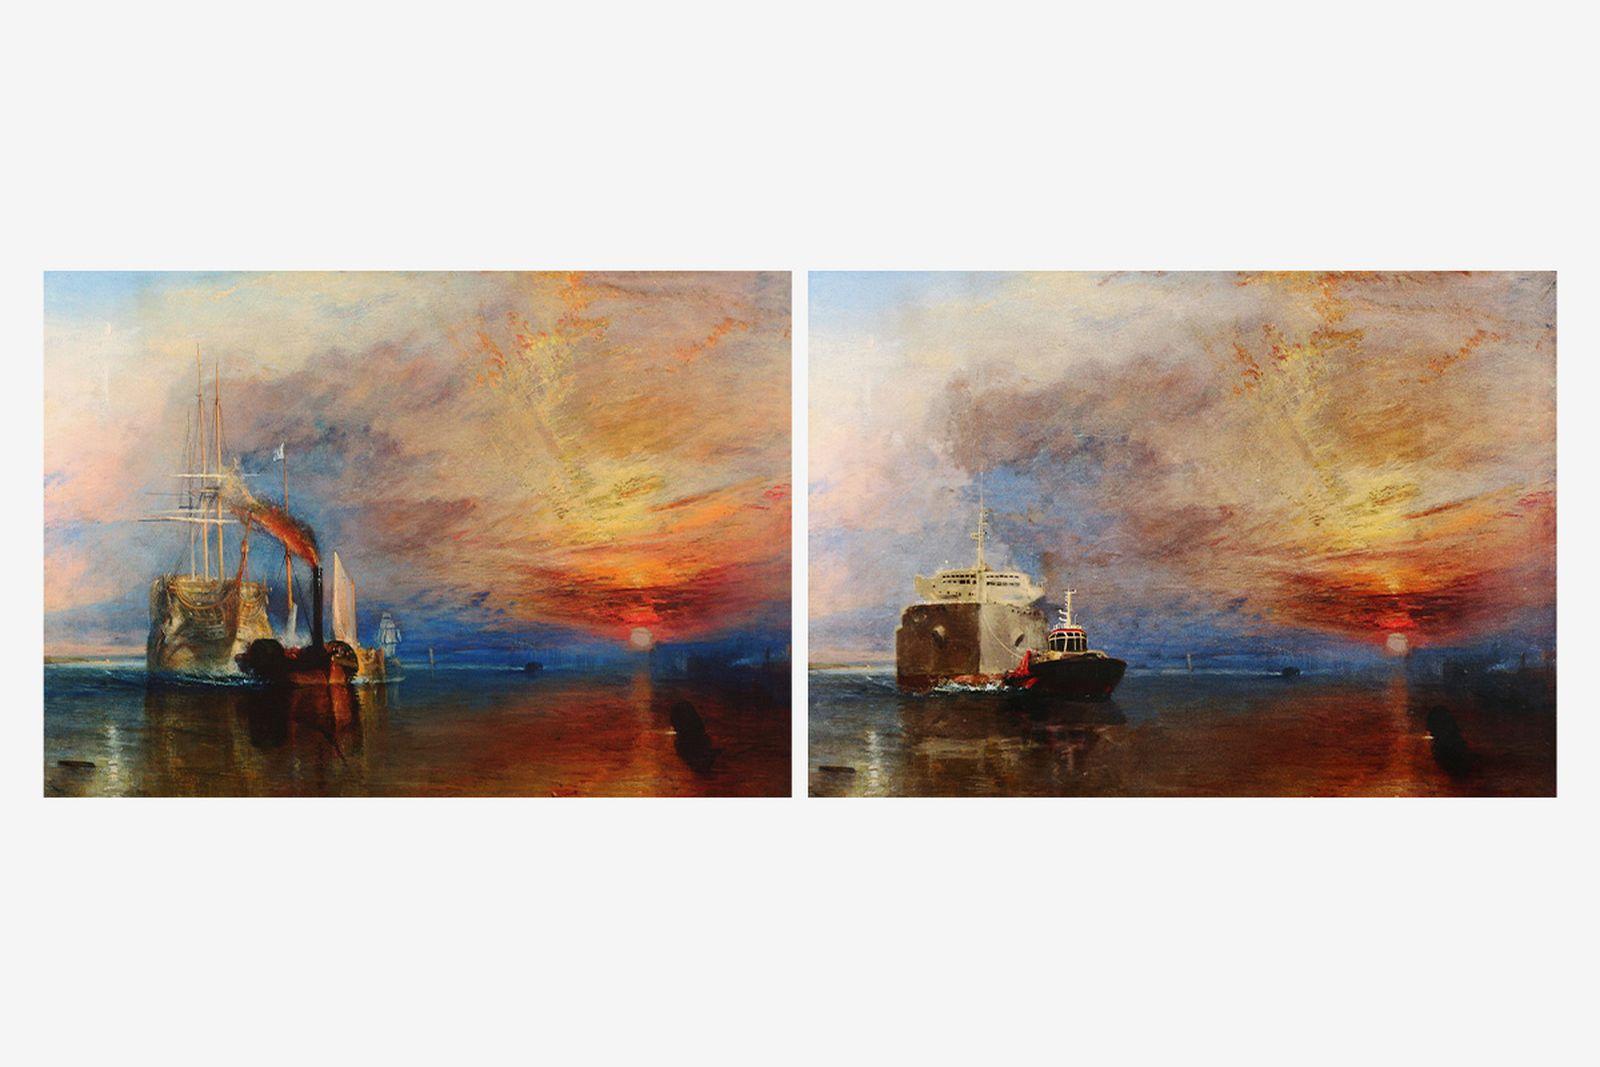 reuben-dangoor-taps-the-great-masters-to-imagine-future-seascapes-04